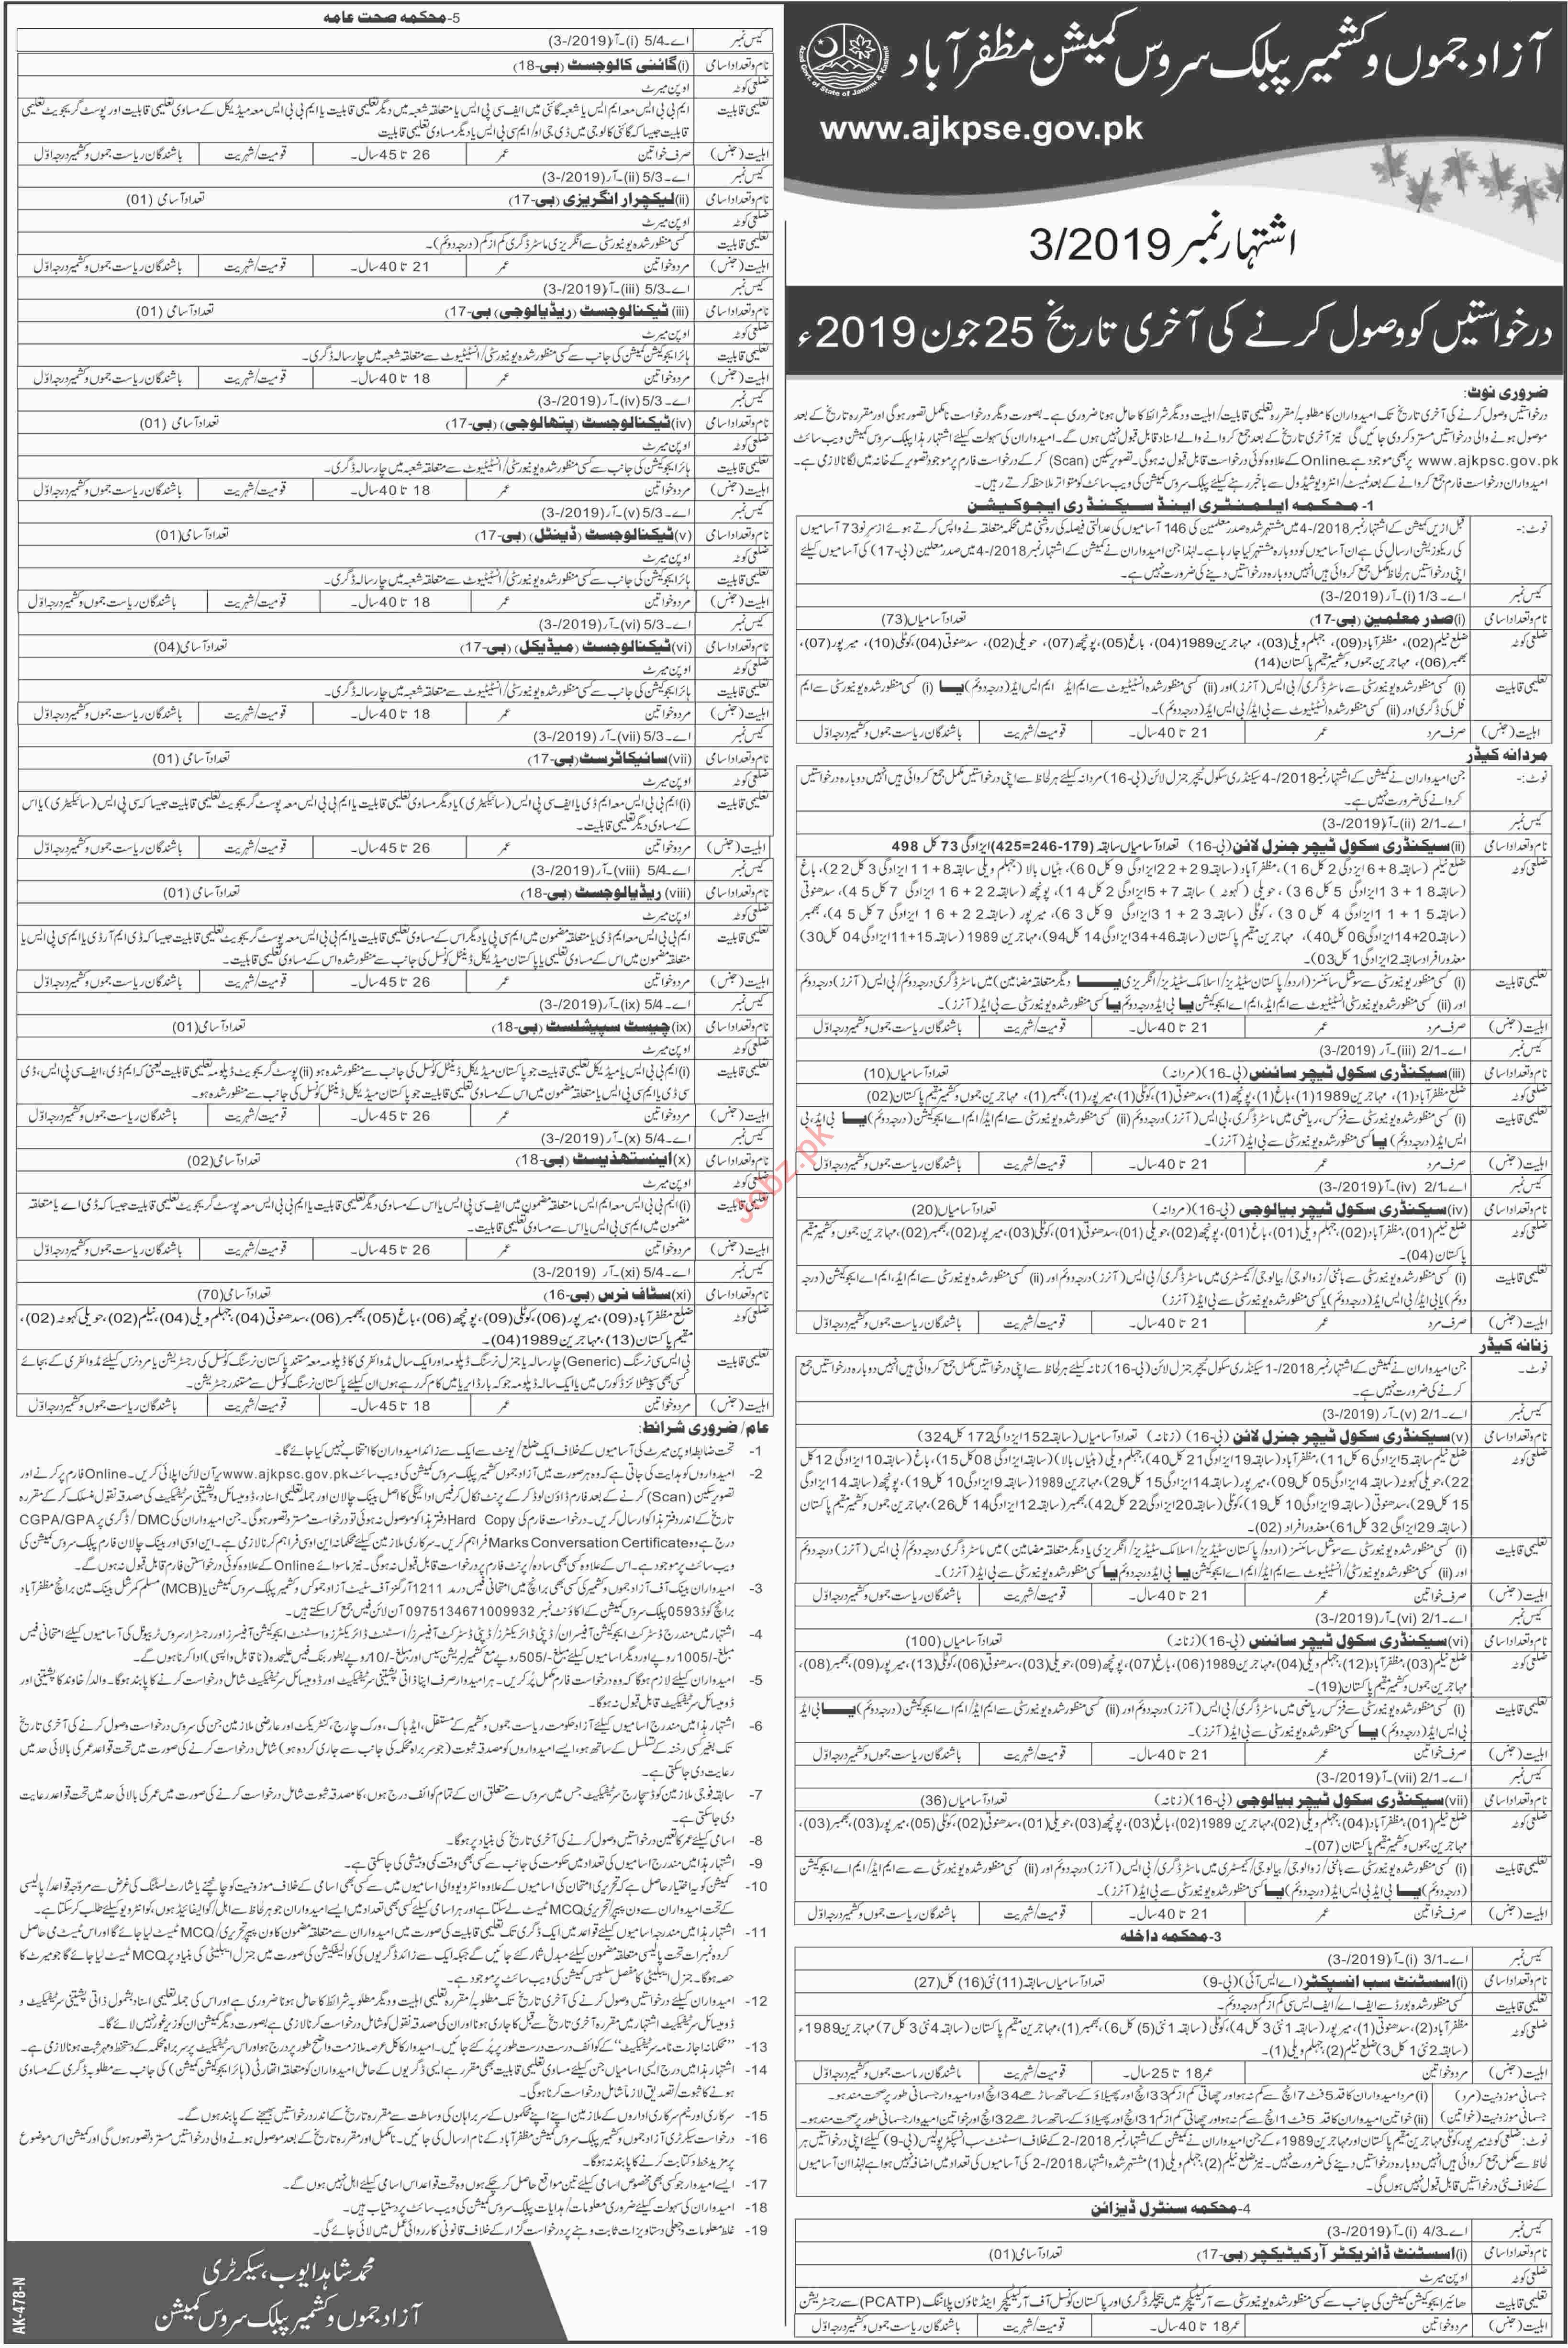 Azad Jammu & Kashmir Public Service Commission Jobs 2019